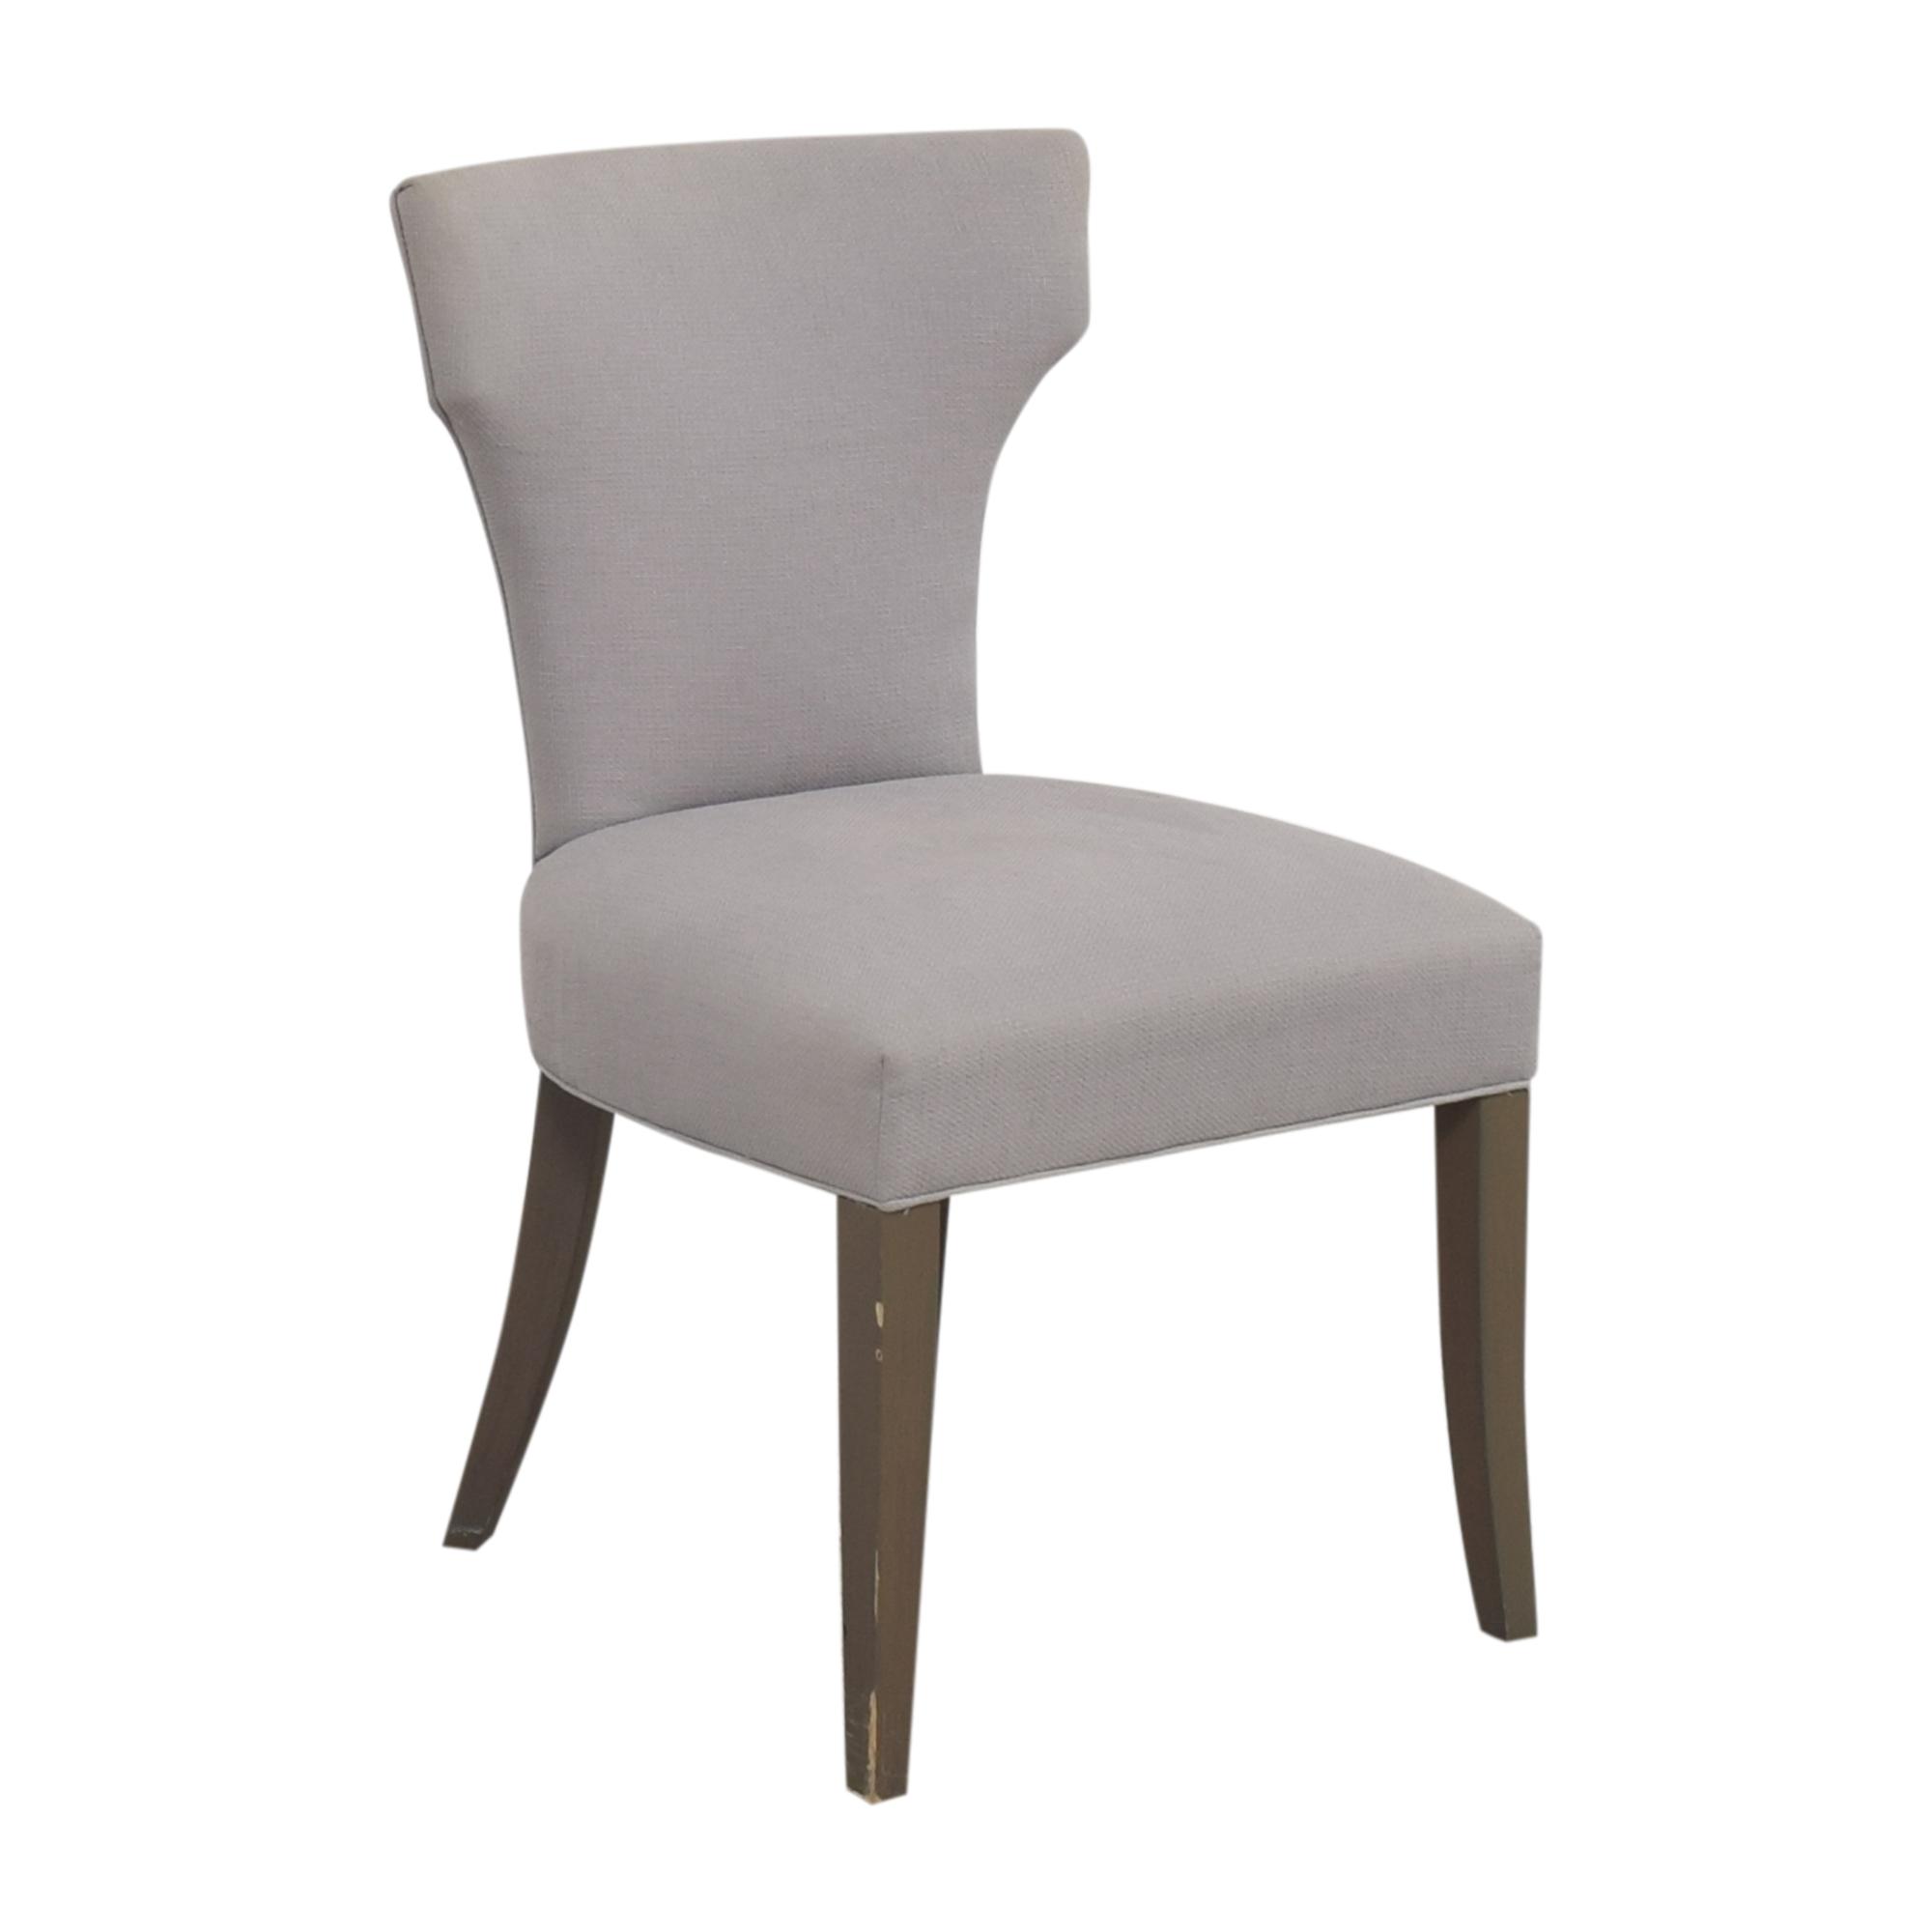 buy Crate & Barrel Sasha Upholstered Dining Side Chair Crate & Barrel